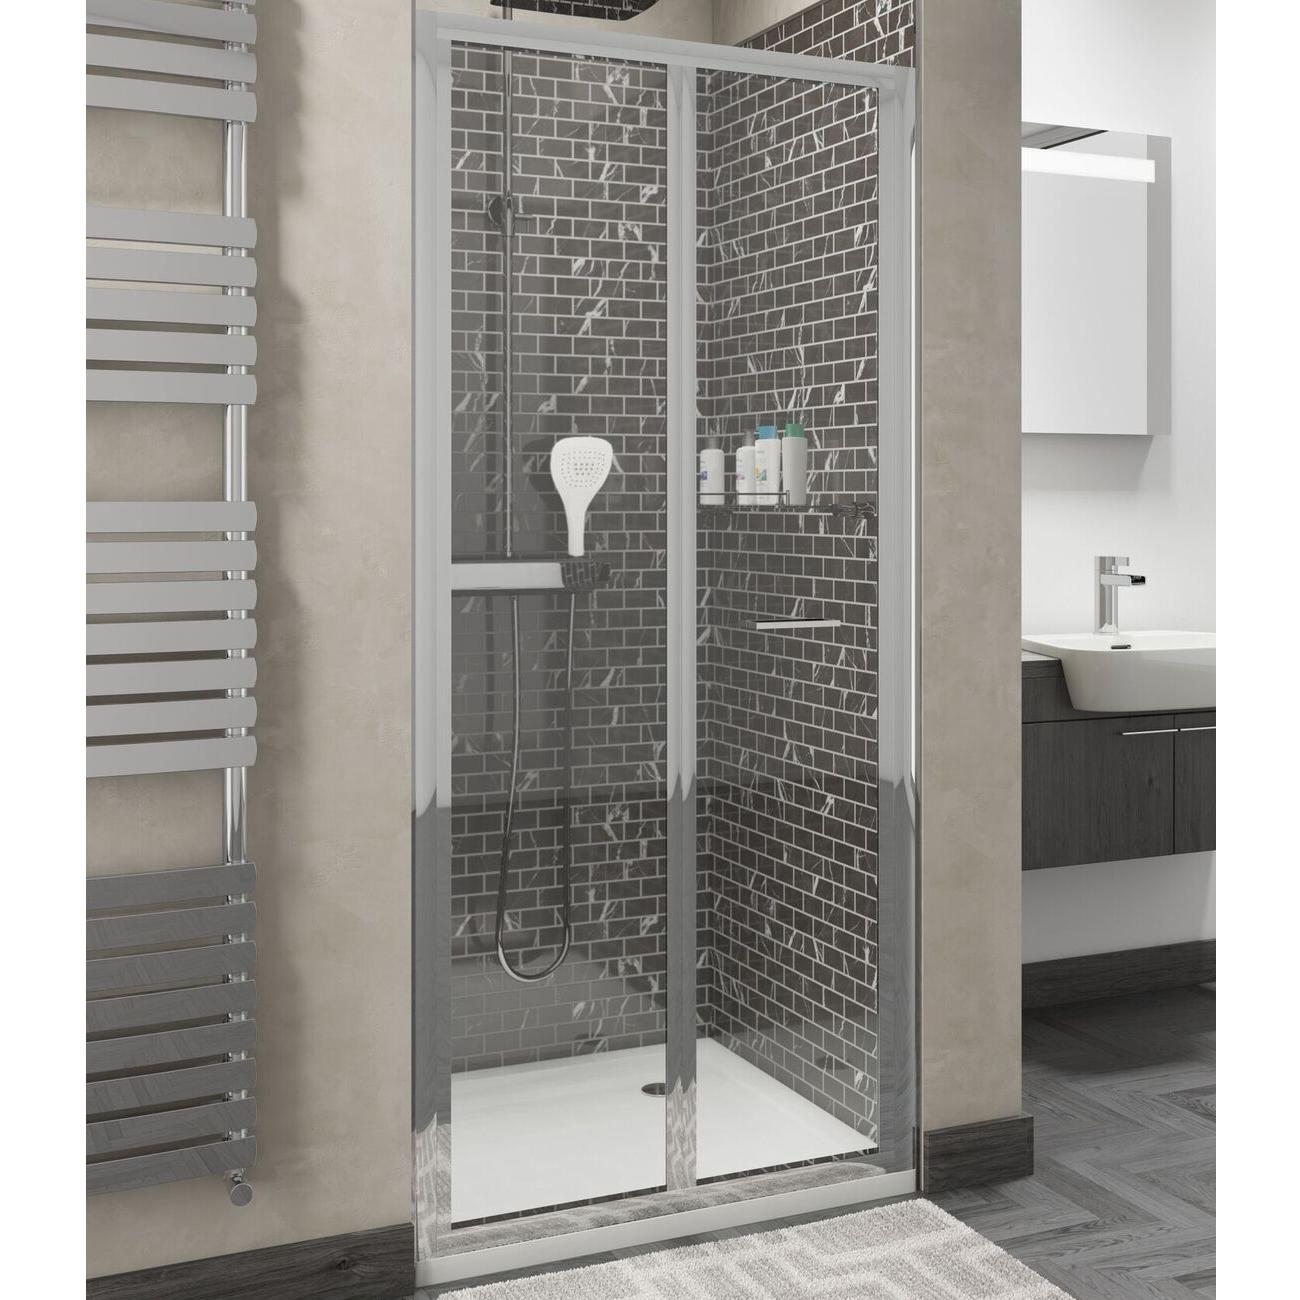 Cali Seis Bi-Fold Door Shower Enclosure 900mm x 900mm - 4mm Glass-4